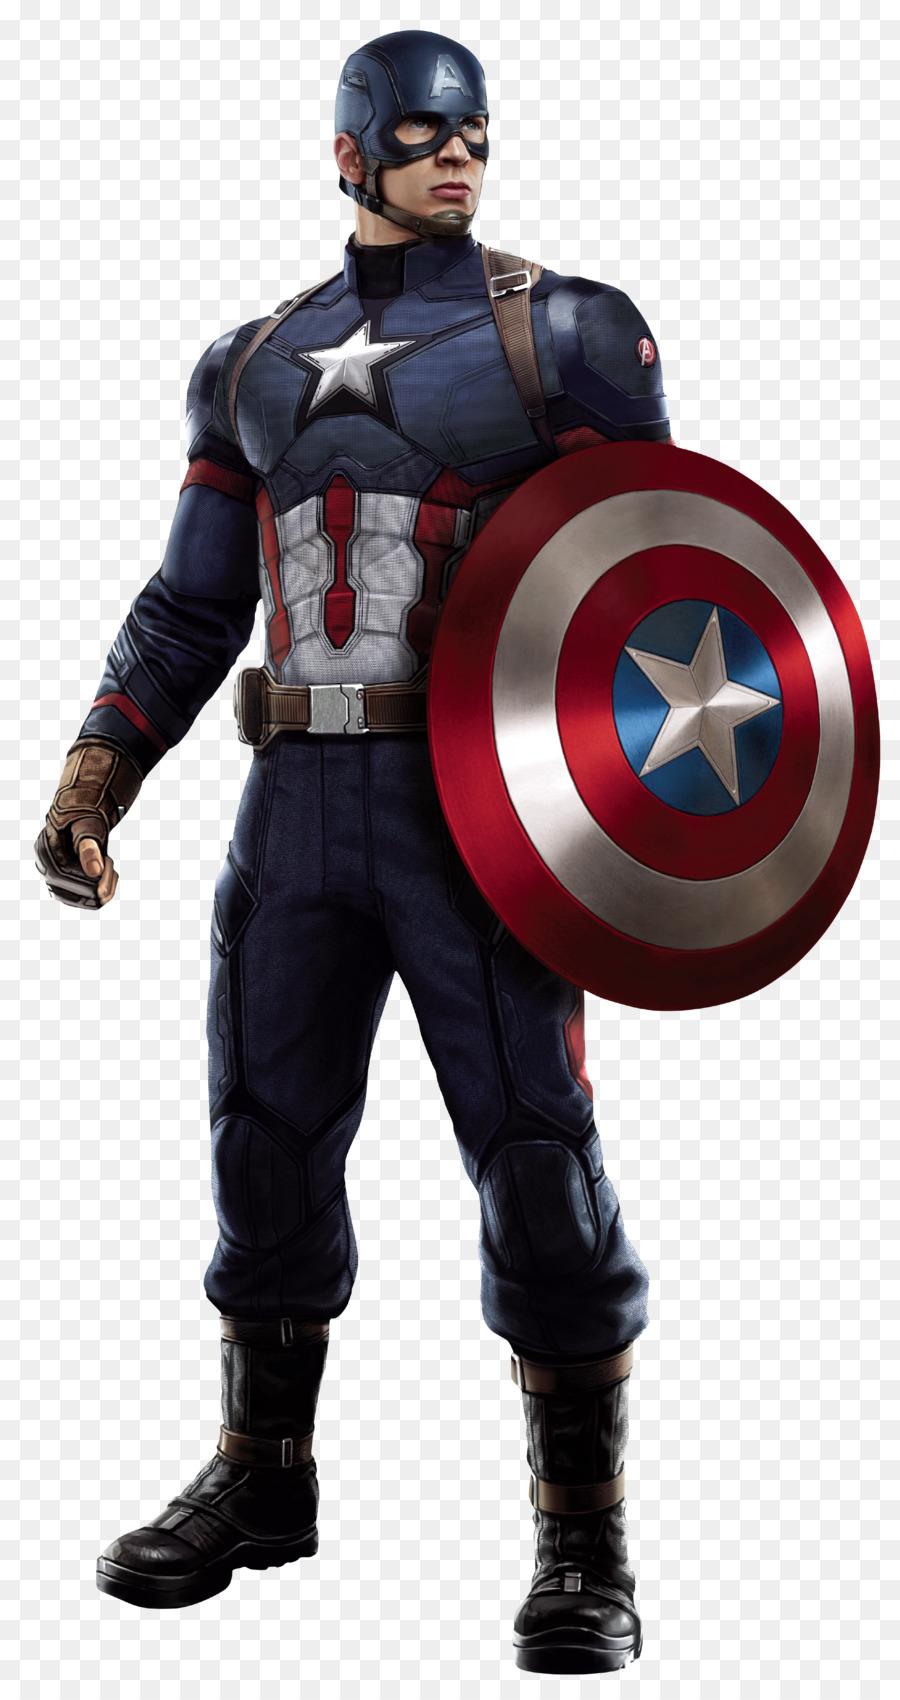 captain america civil war captain america clipart Captain America: Civil War Chris Evans